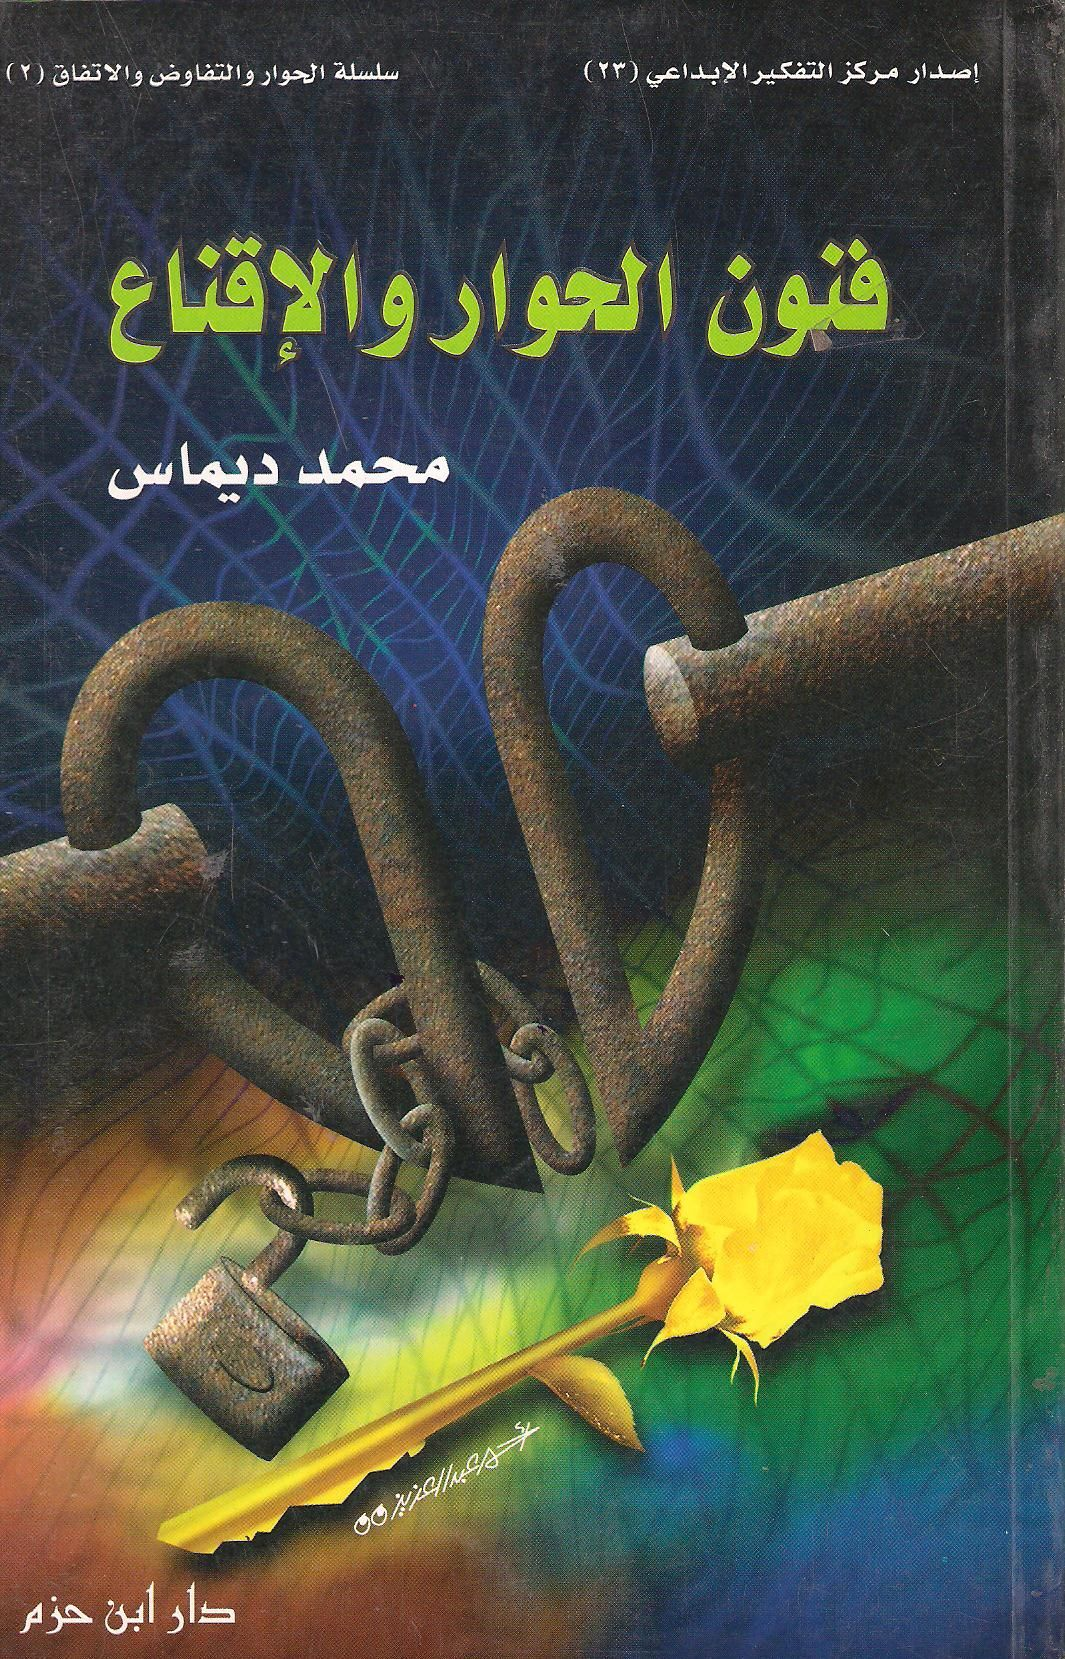 Pin By Leila Brahi On أفضل ما قرأت فى علم الاتصال وتحليل الأنماط البشرية Ebooks Free Books Pdf Books Reading Arabic Books